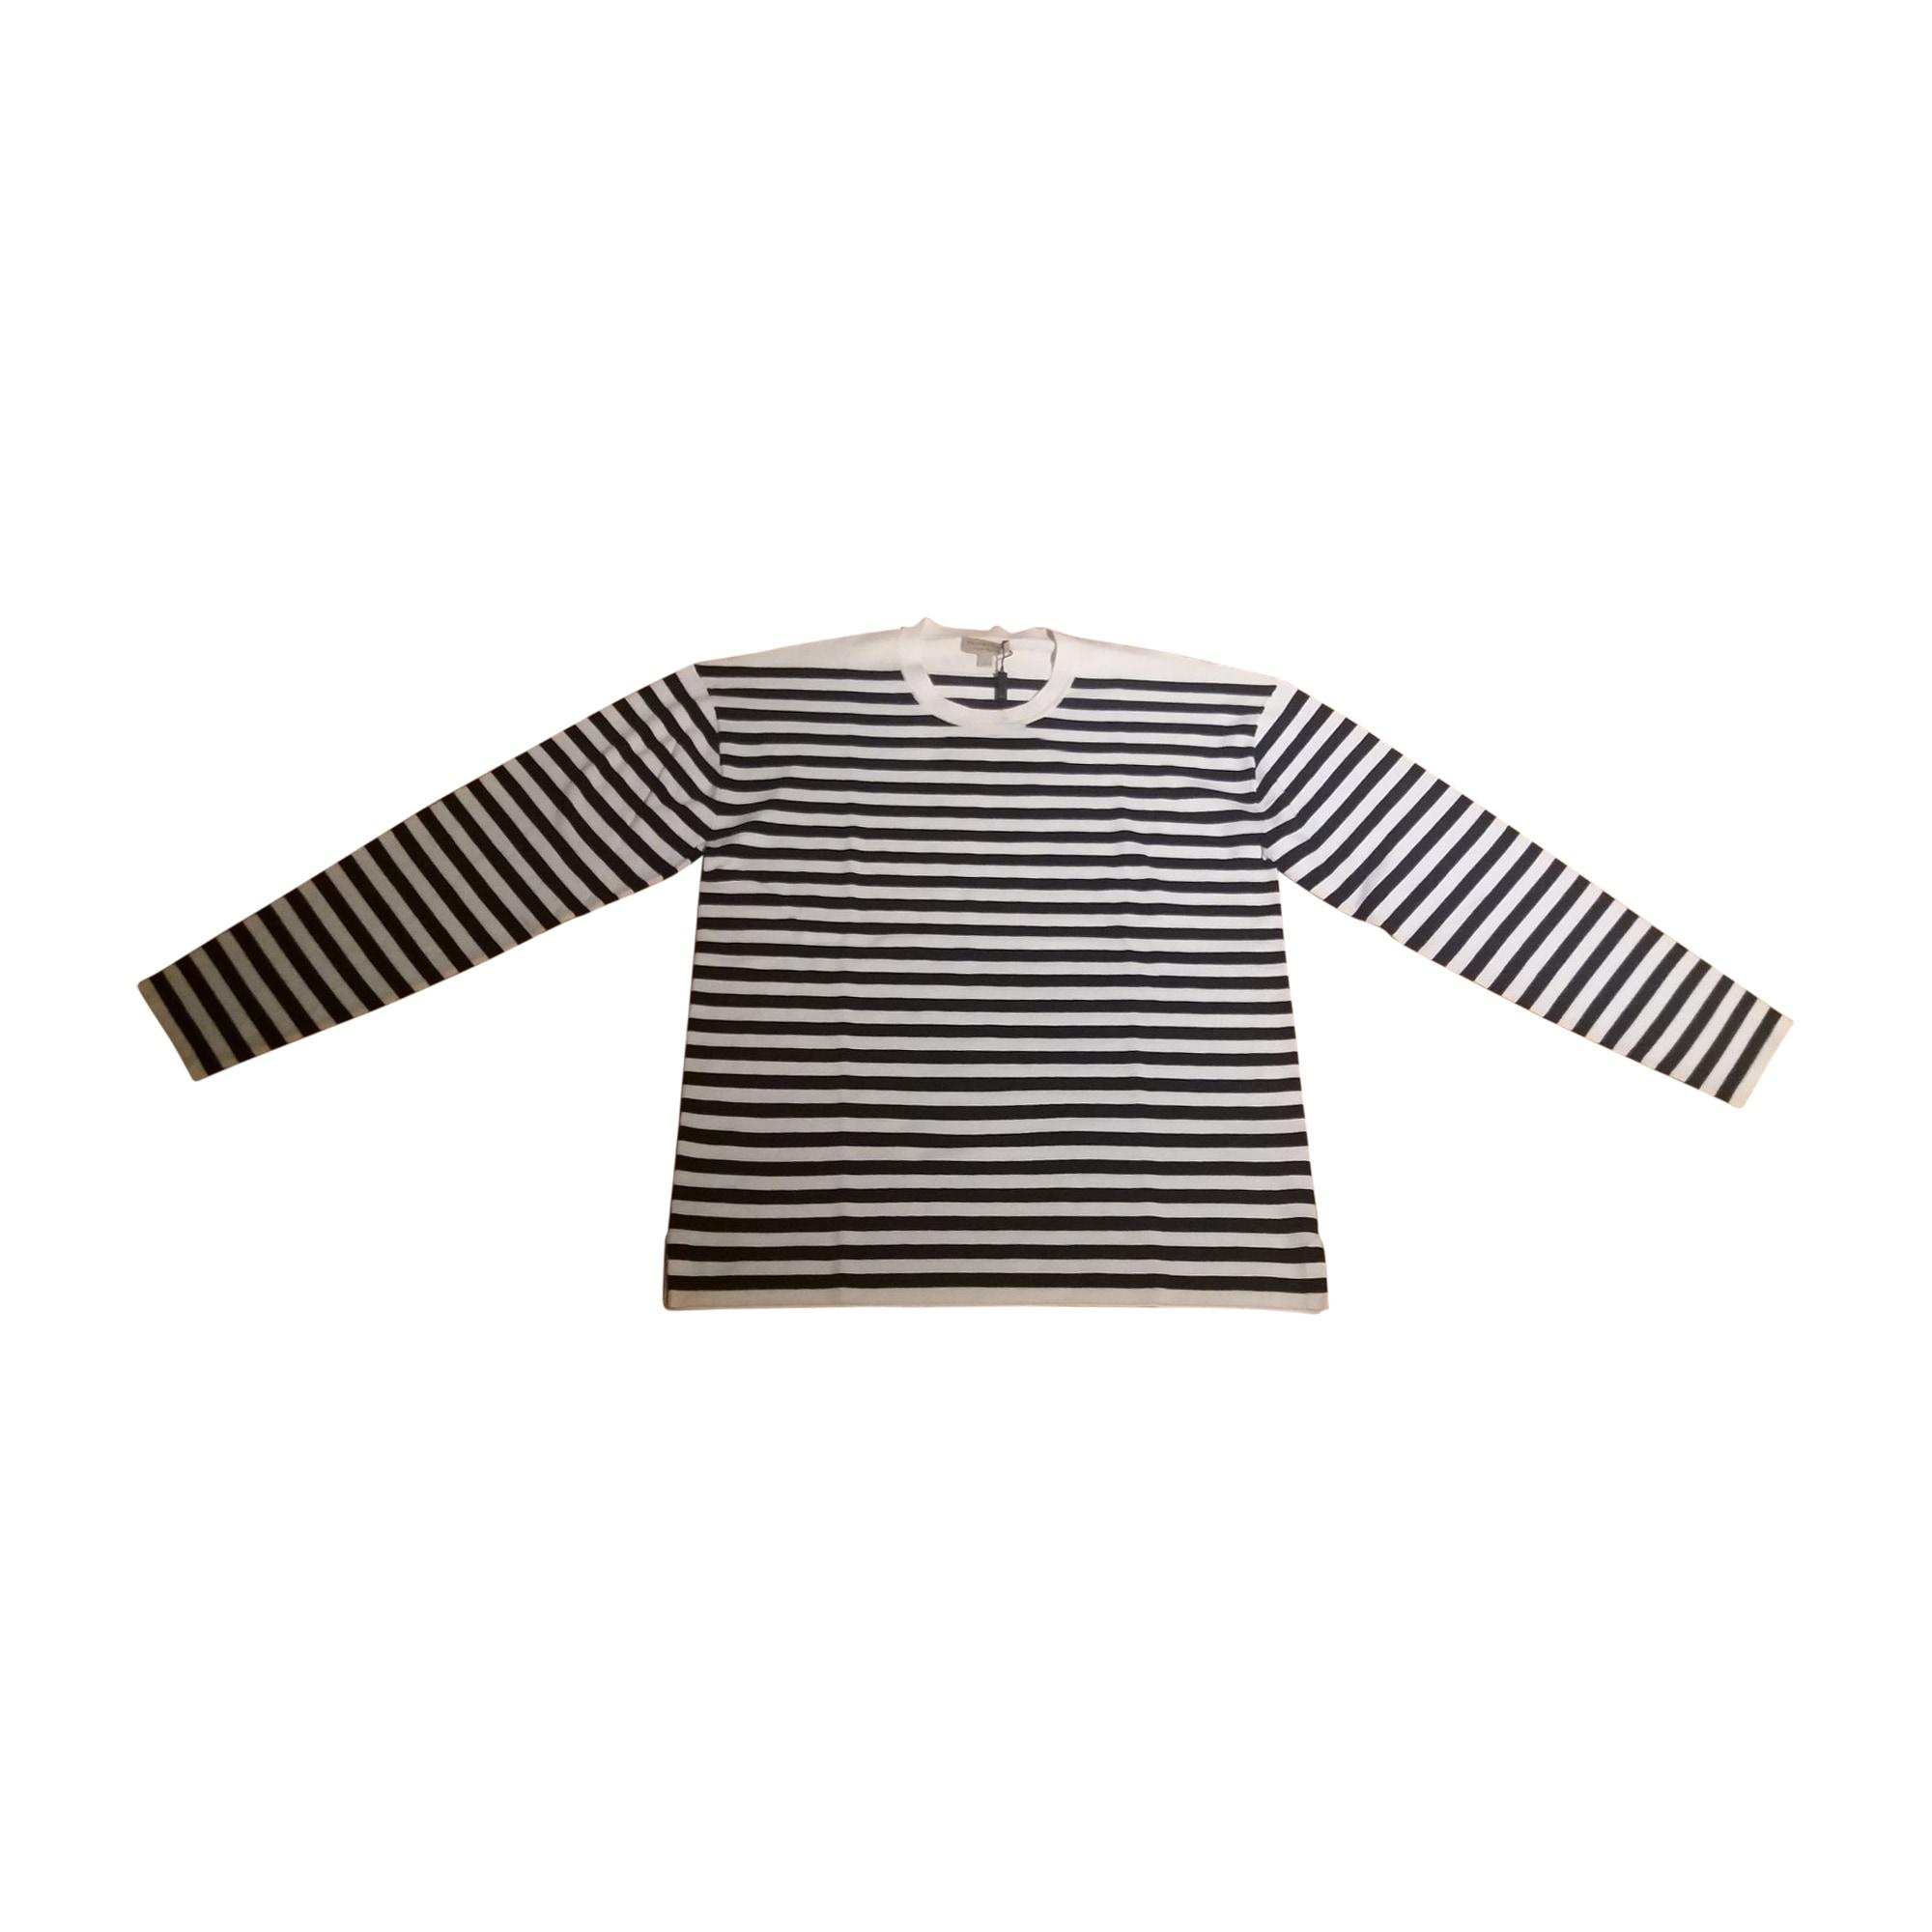 Sweater BURBERRY Noir et Blanc